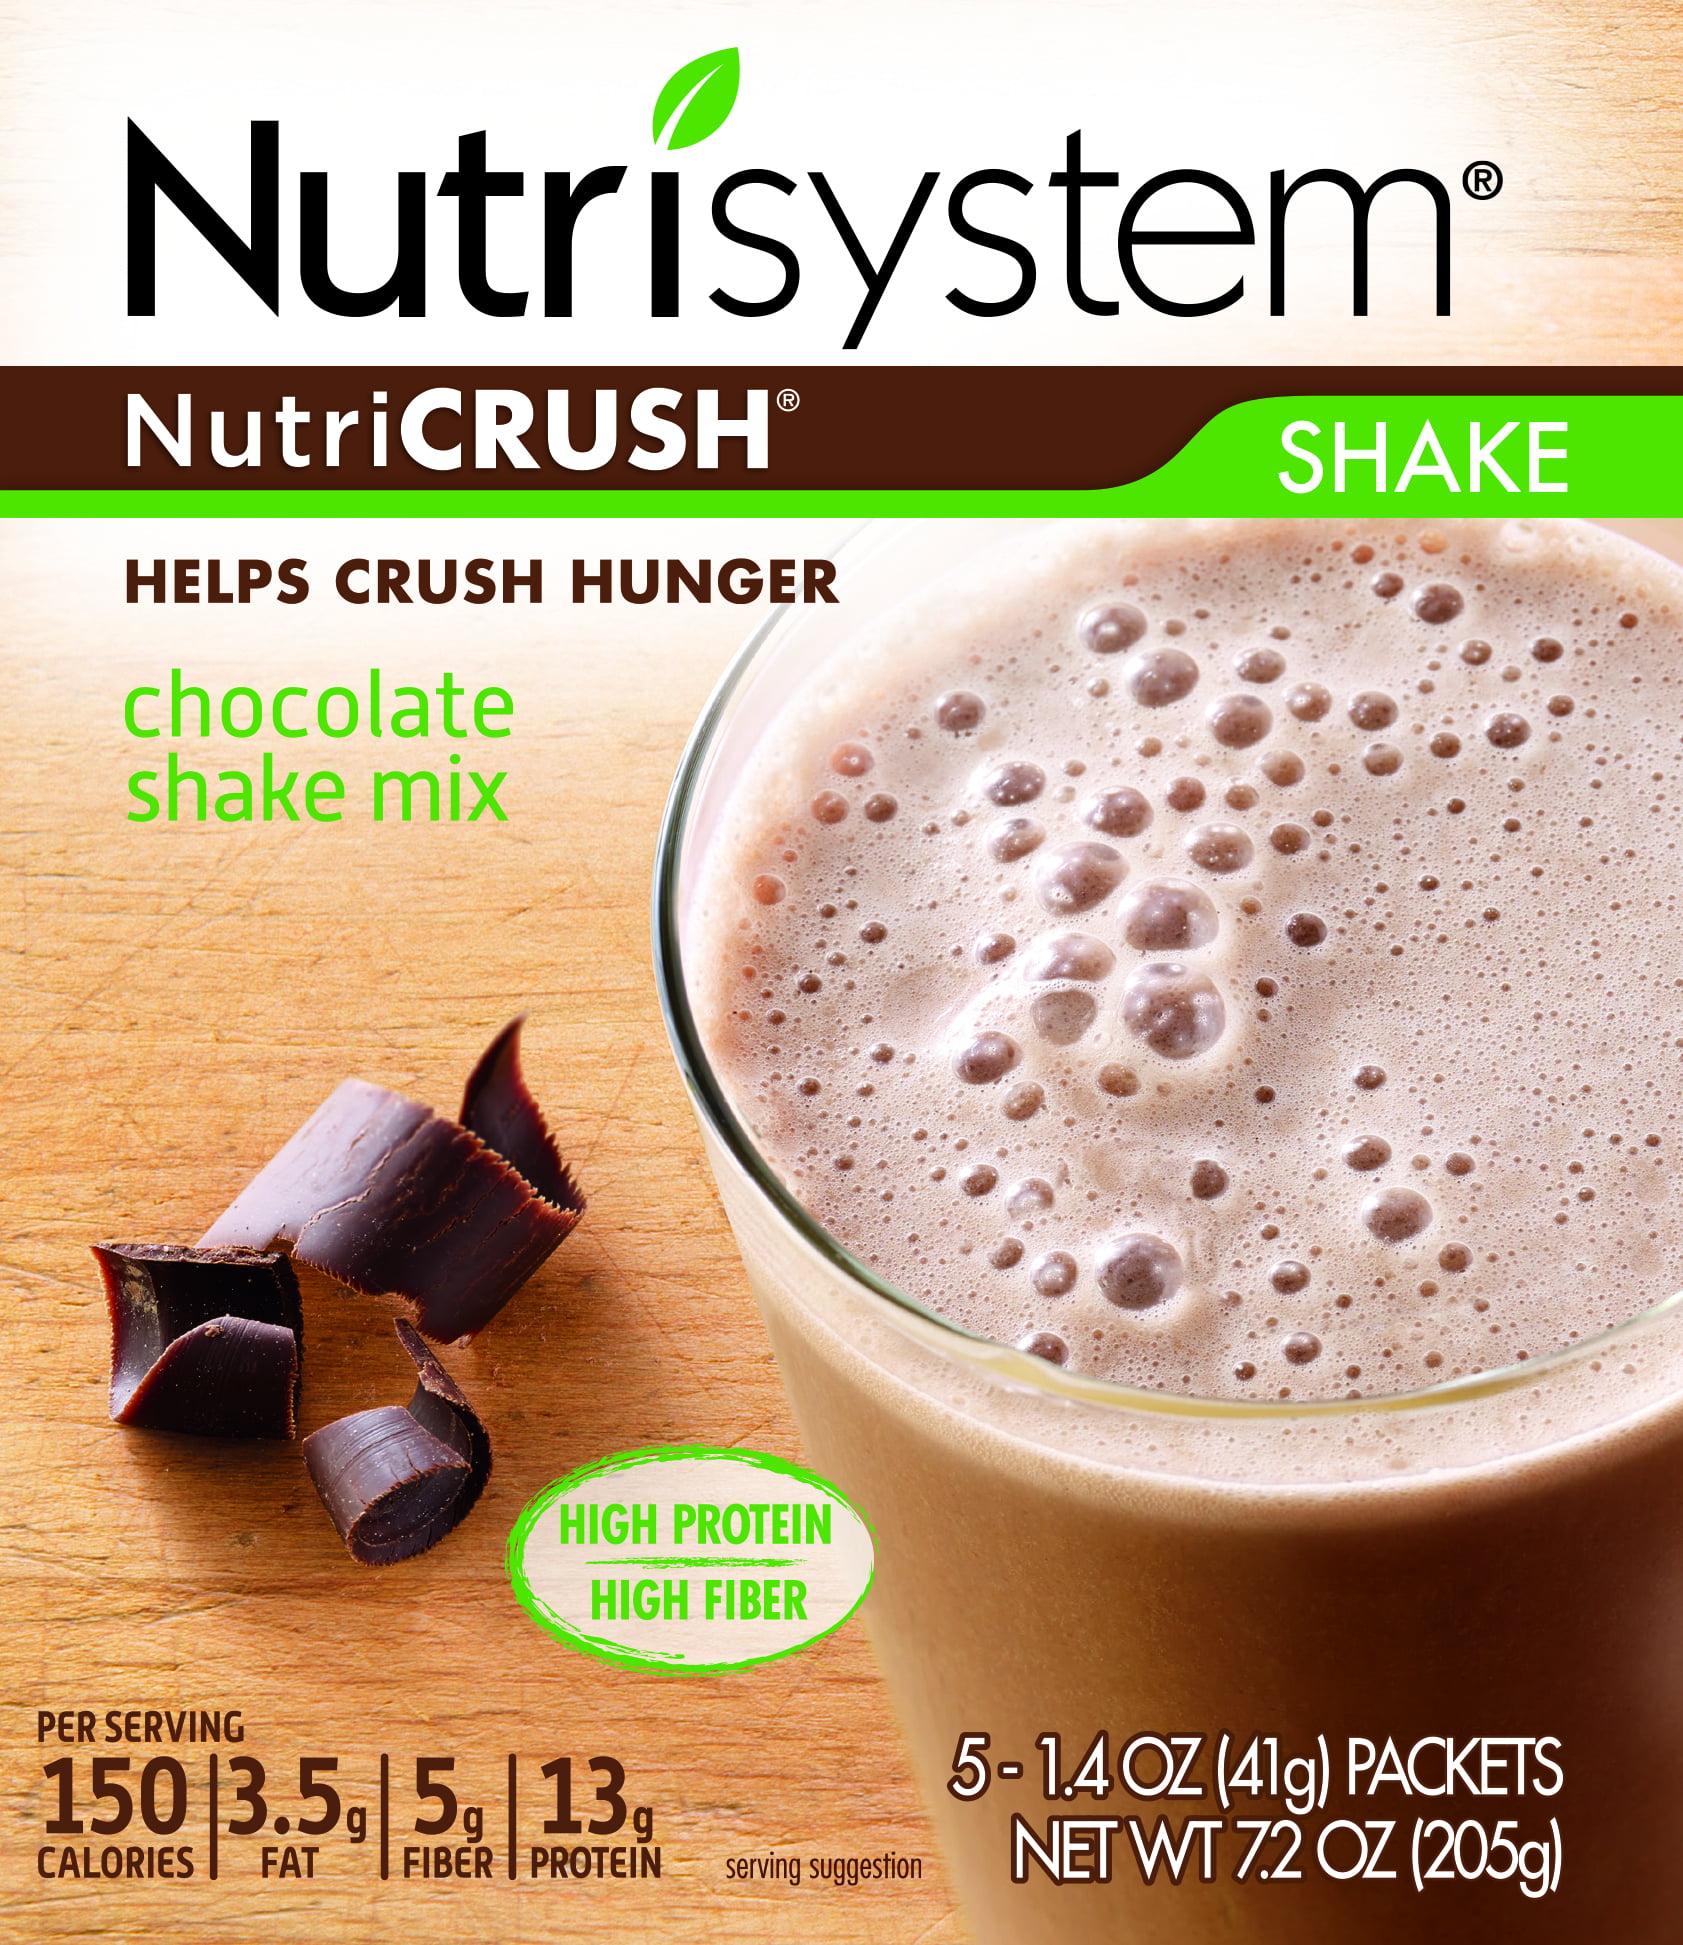 Nutrisystem NutriCrush Chocolate Shake